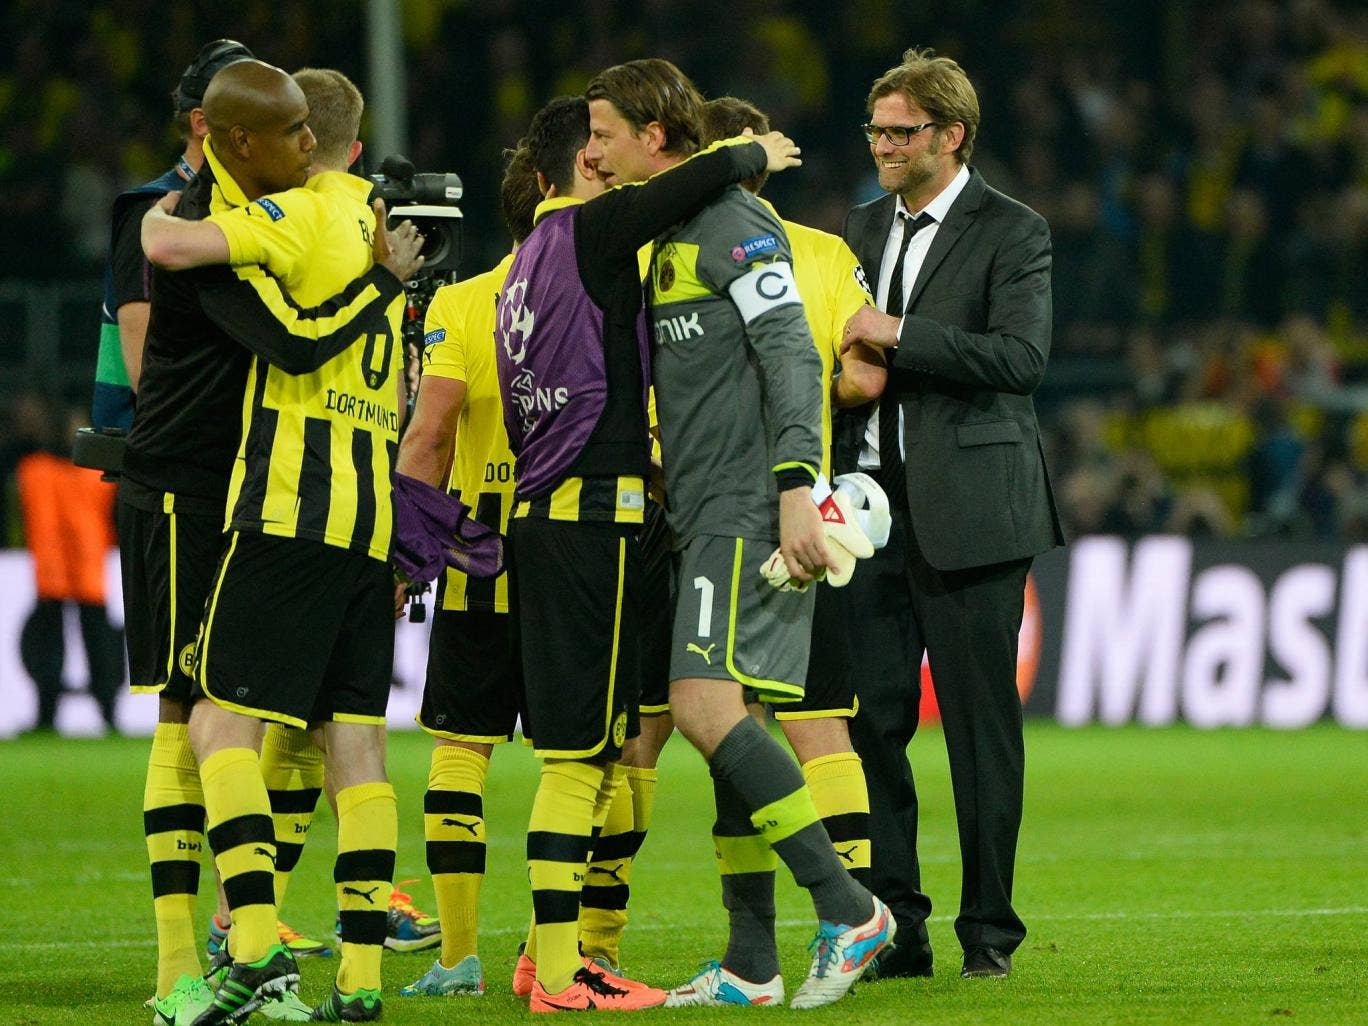 Jurgen Klopp celebrates with his players after Dortmund beat Real Madrid 4-1